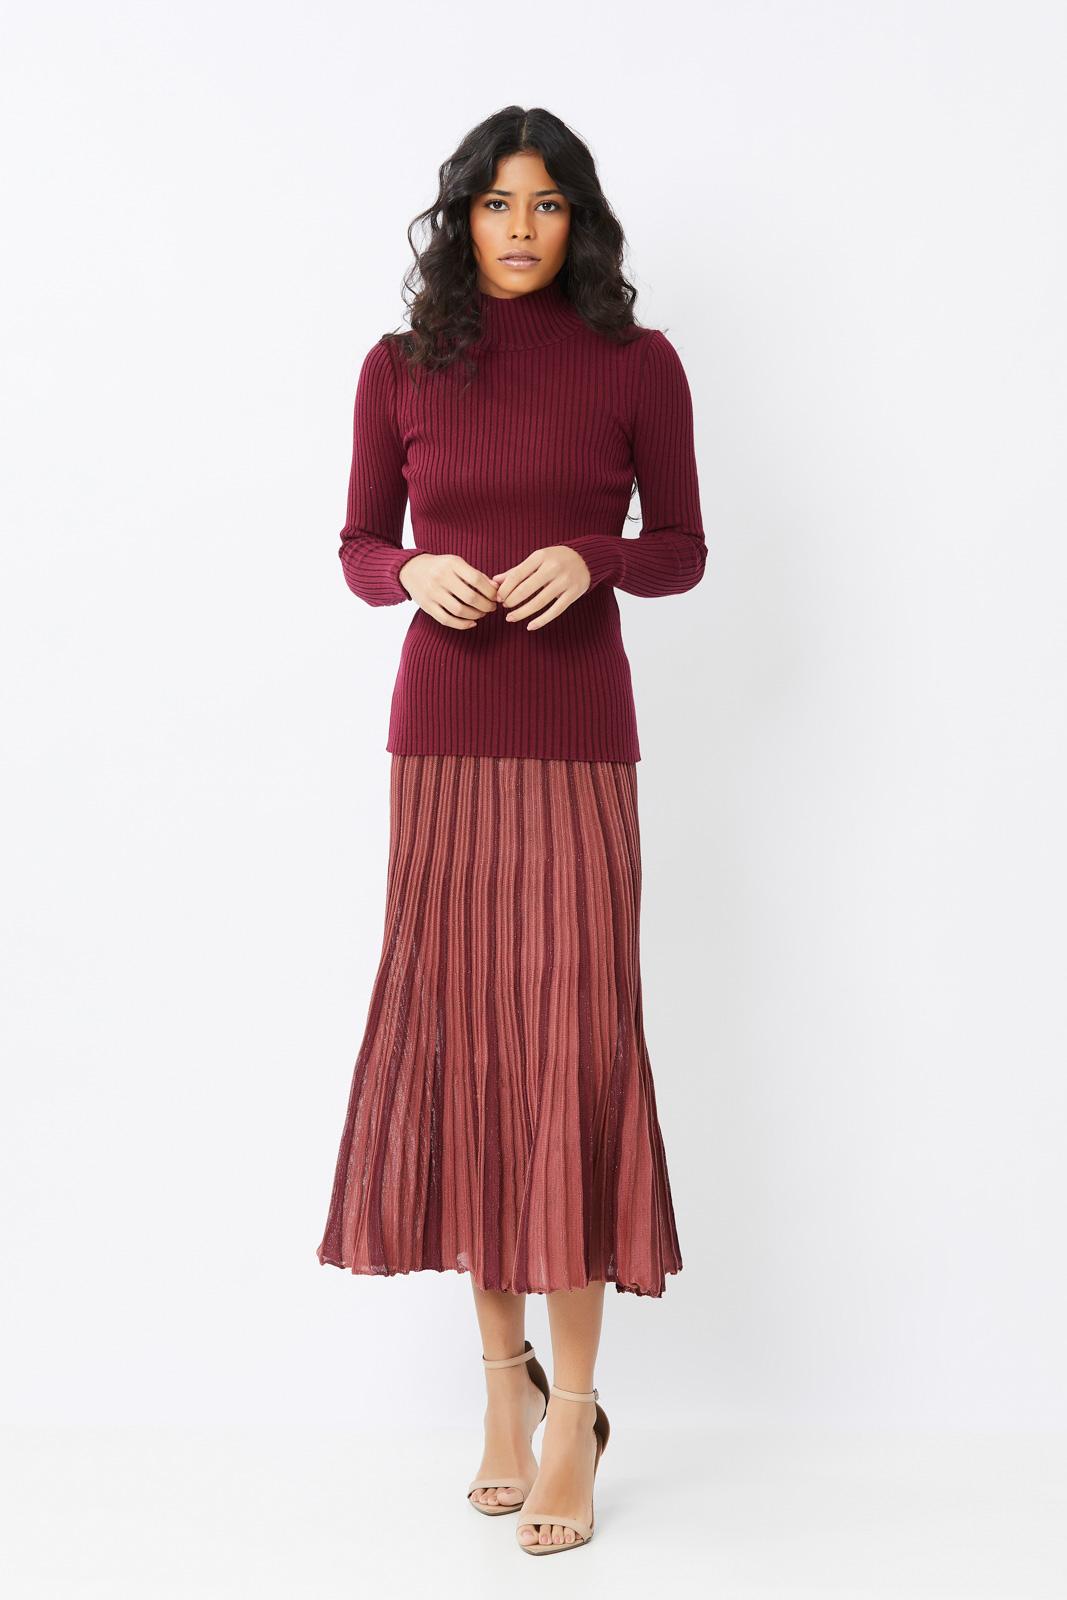 Conjunto de tricot Ralm saia midi e blusa canelada gola alta - Vinho